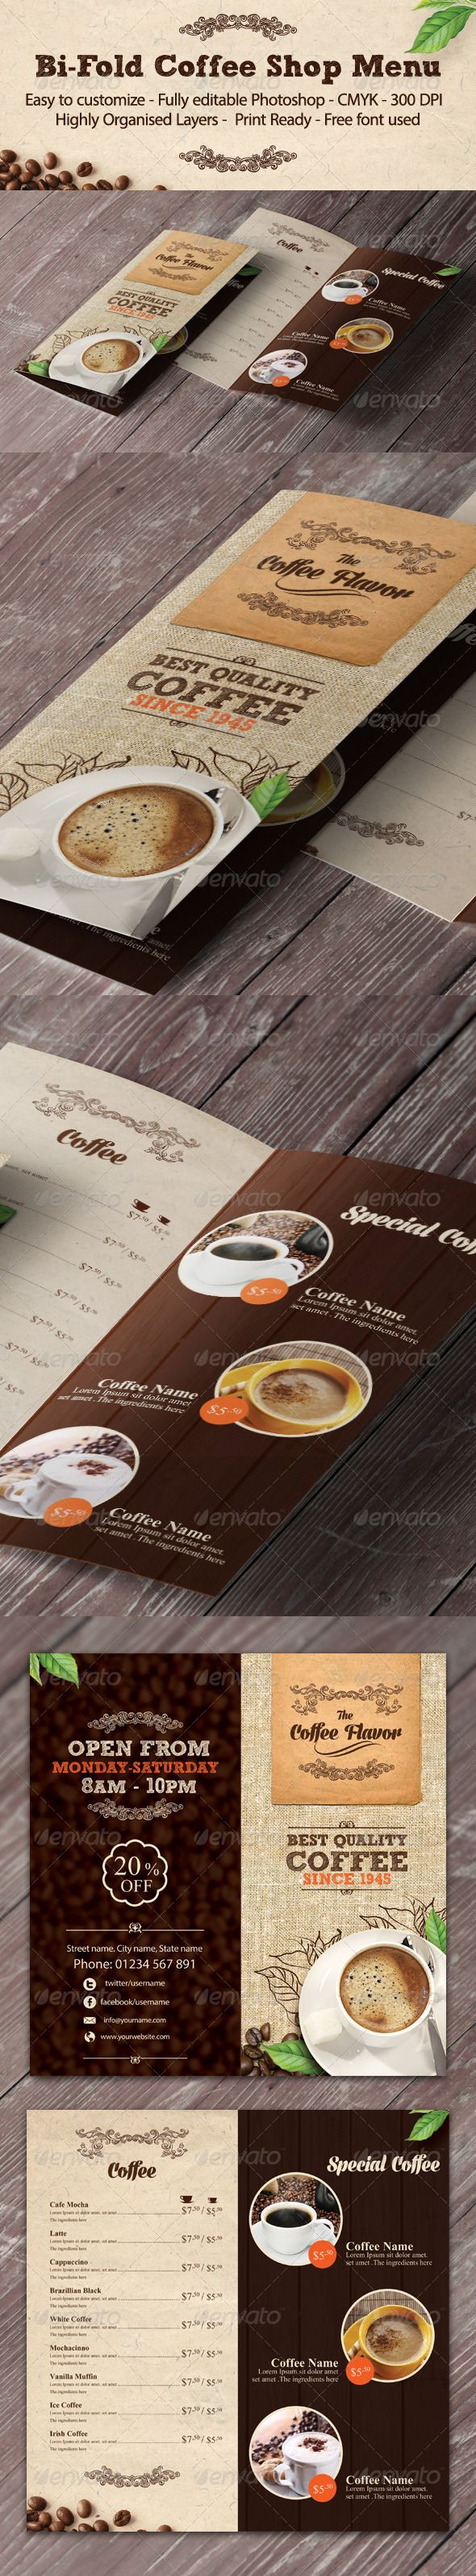 Bi-fold Coffee Shop Menu Template #design #speisekarte Download: http://graphicriver.net/item/bifold-coffee-shop-menu-template/8023992?ref=ksioks